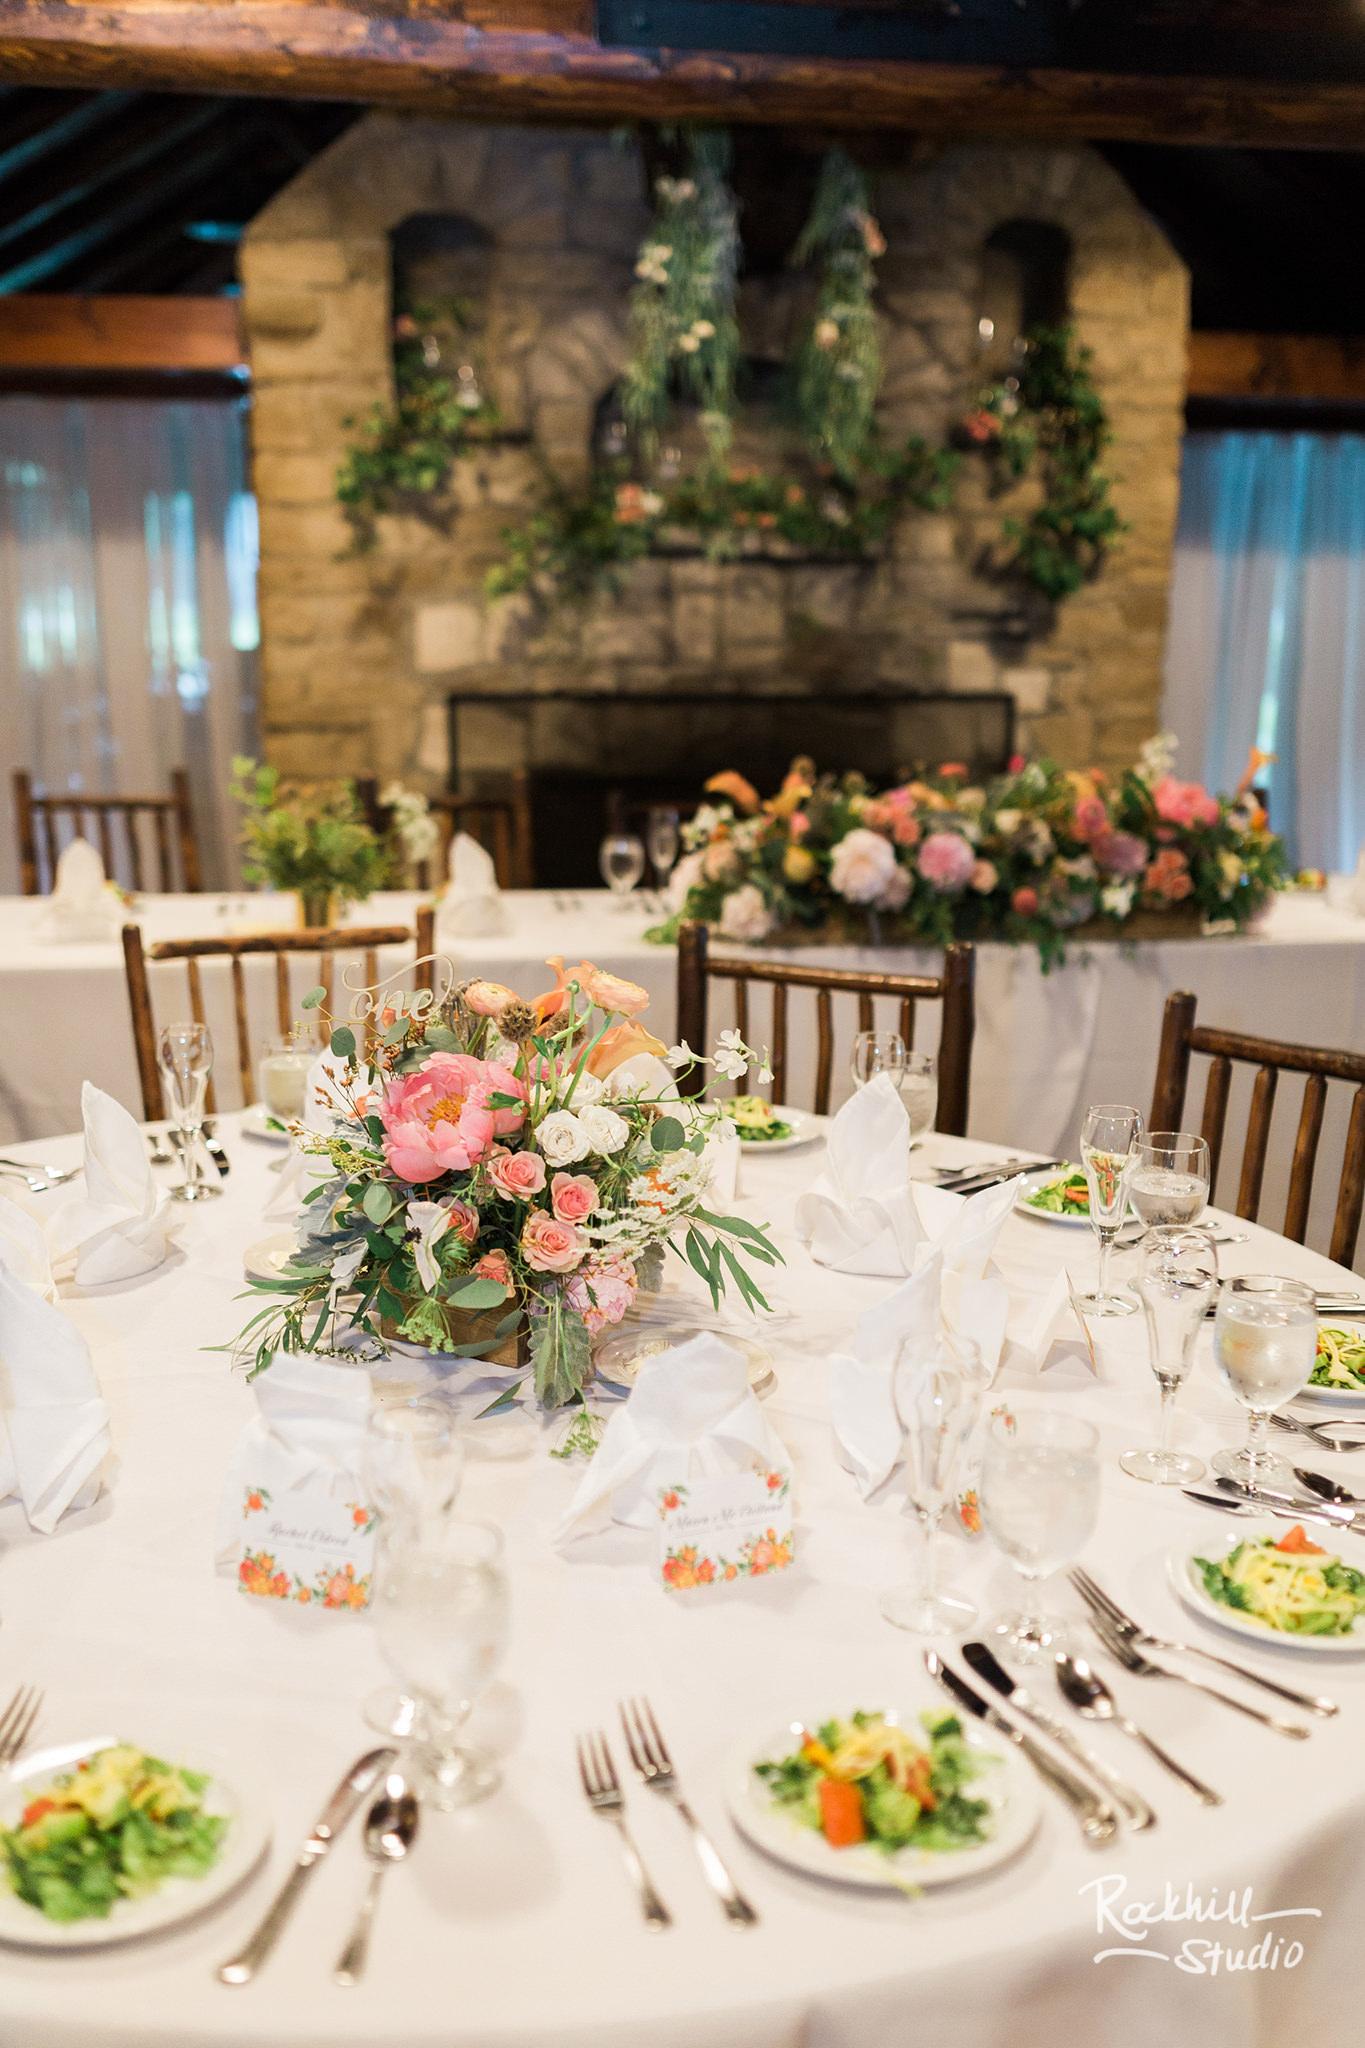 Drummond Island Wedding, Reception Tables, Traverse City Wedding Photographer Rockhill Studio